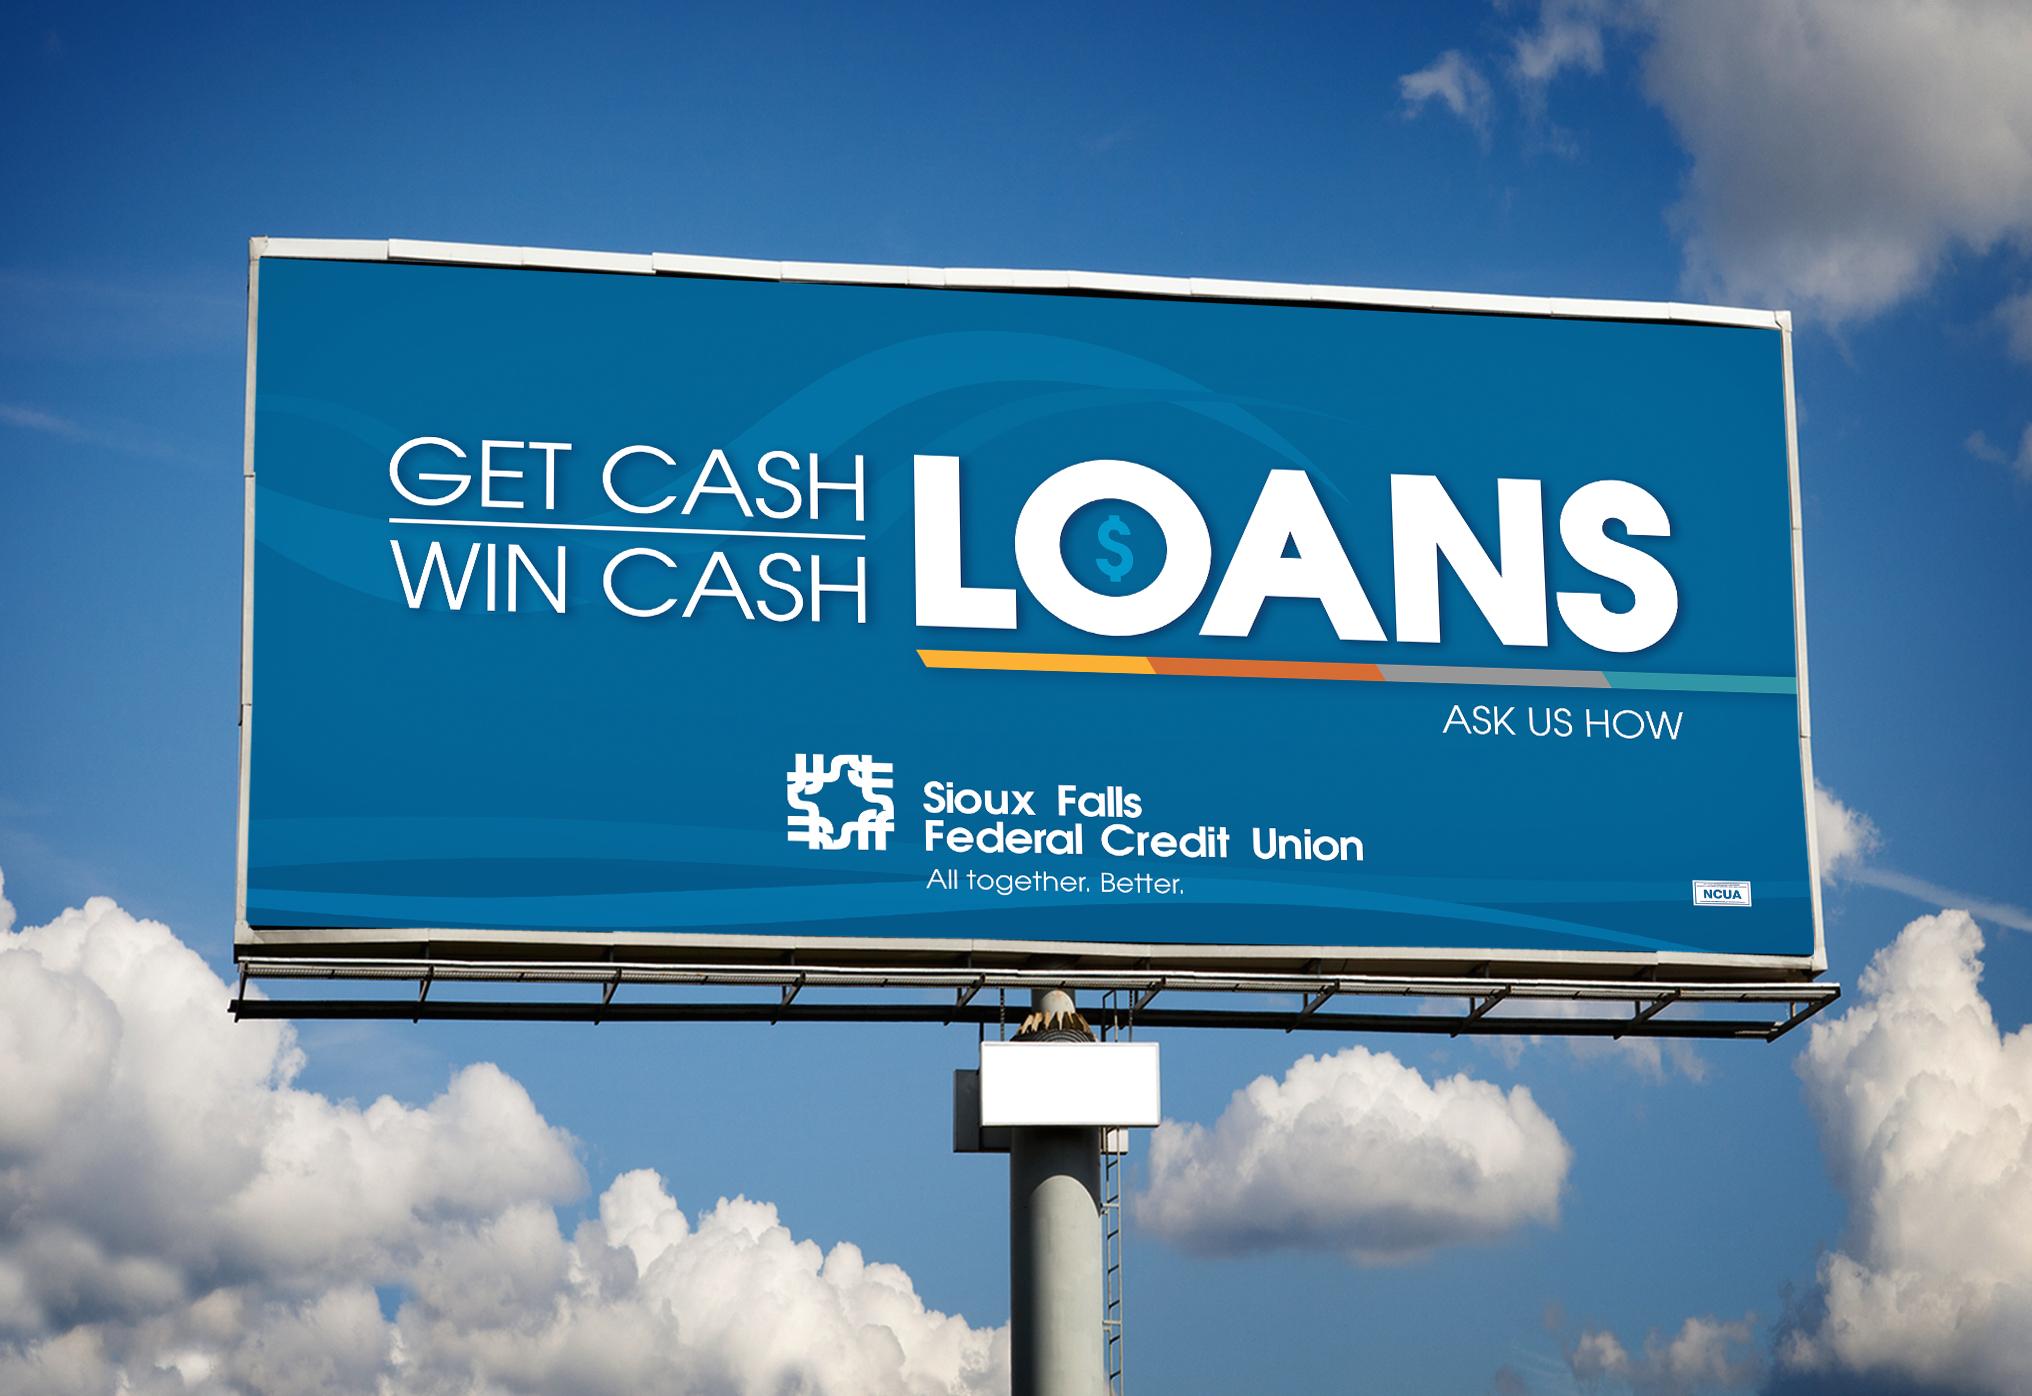 SFFCU_Billboards_GetCashWinCash.png